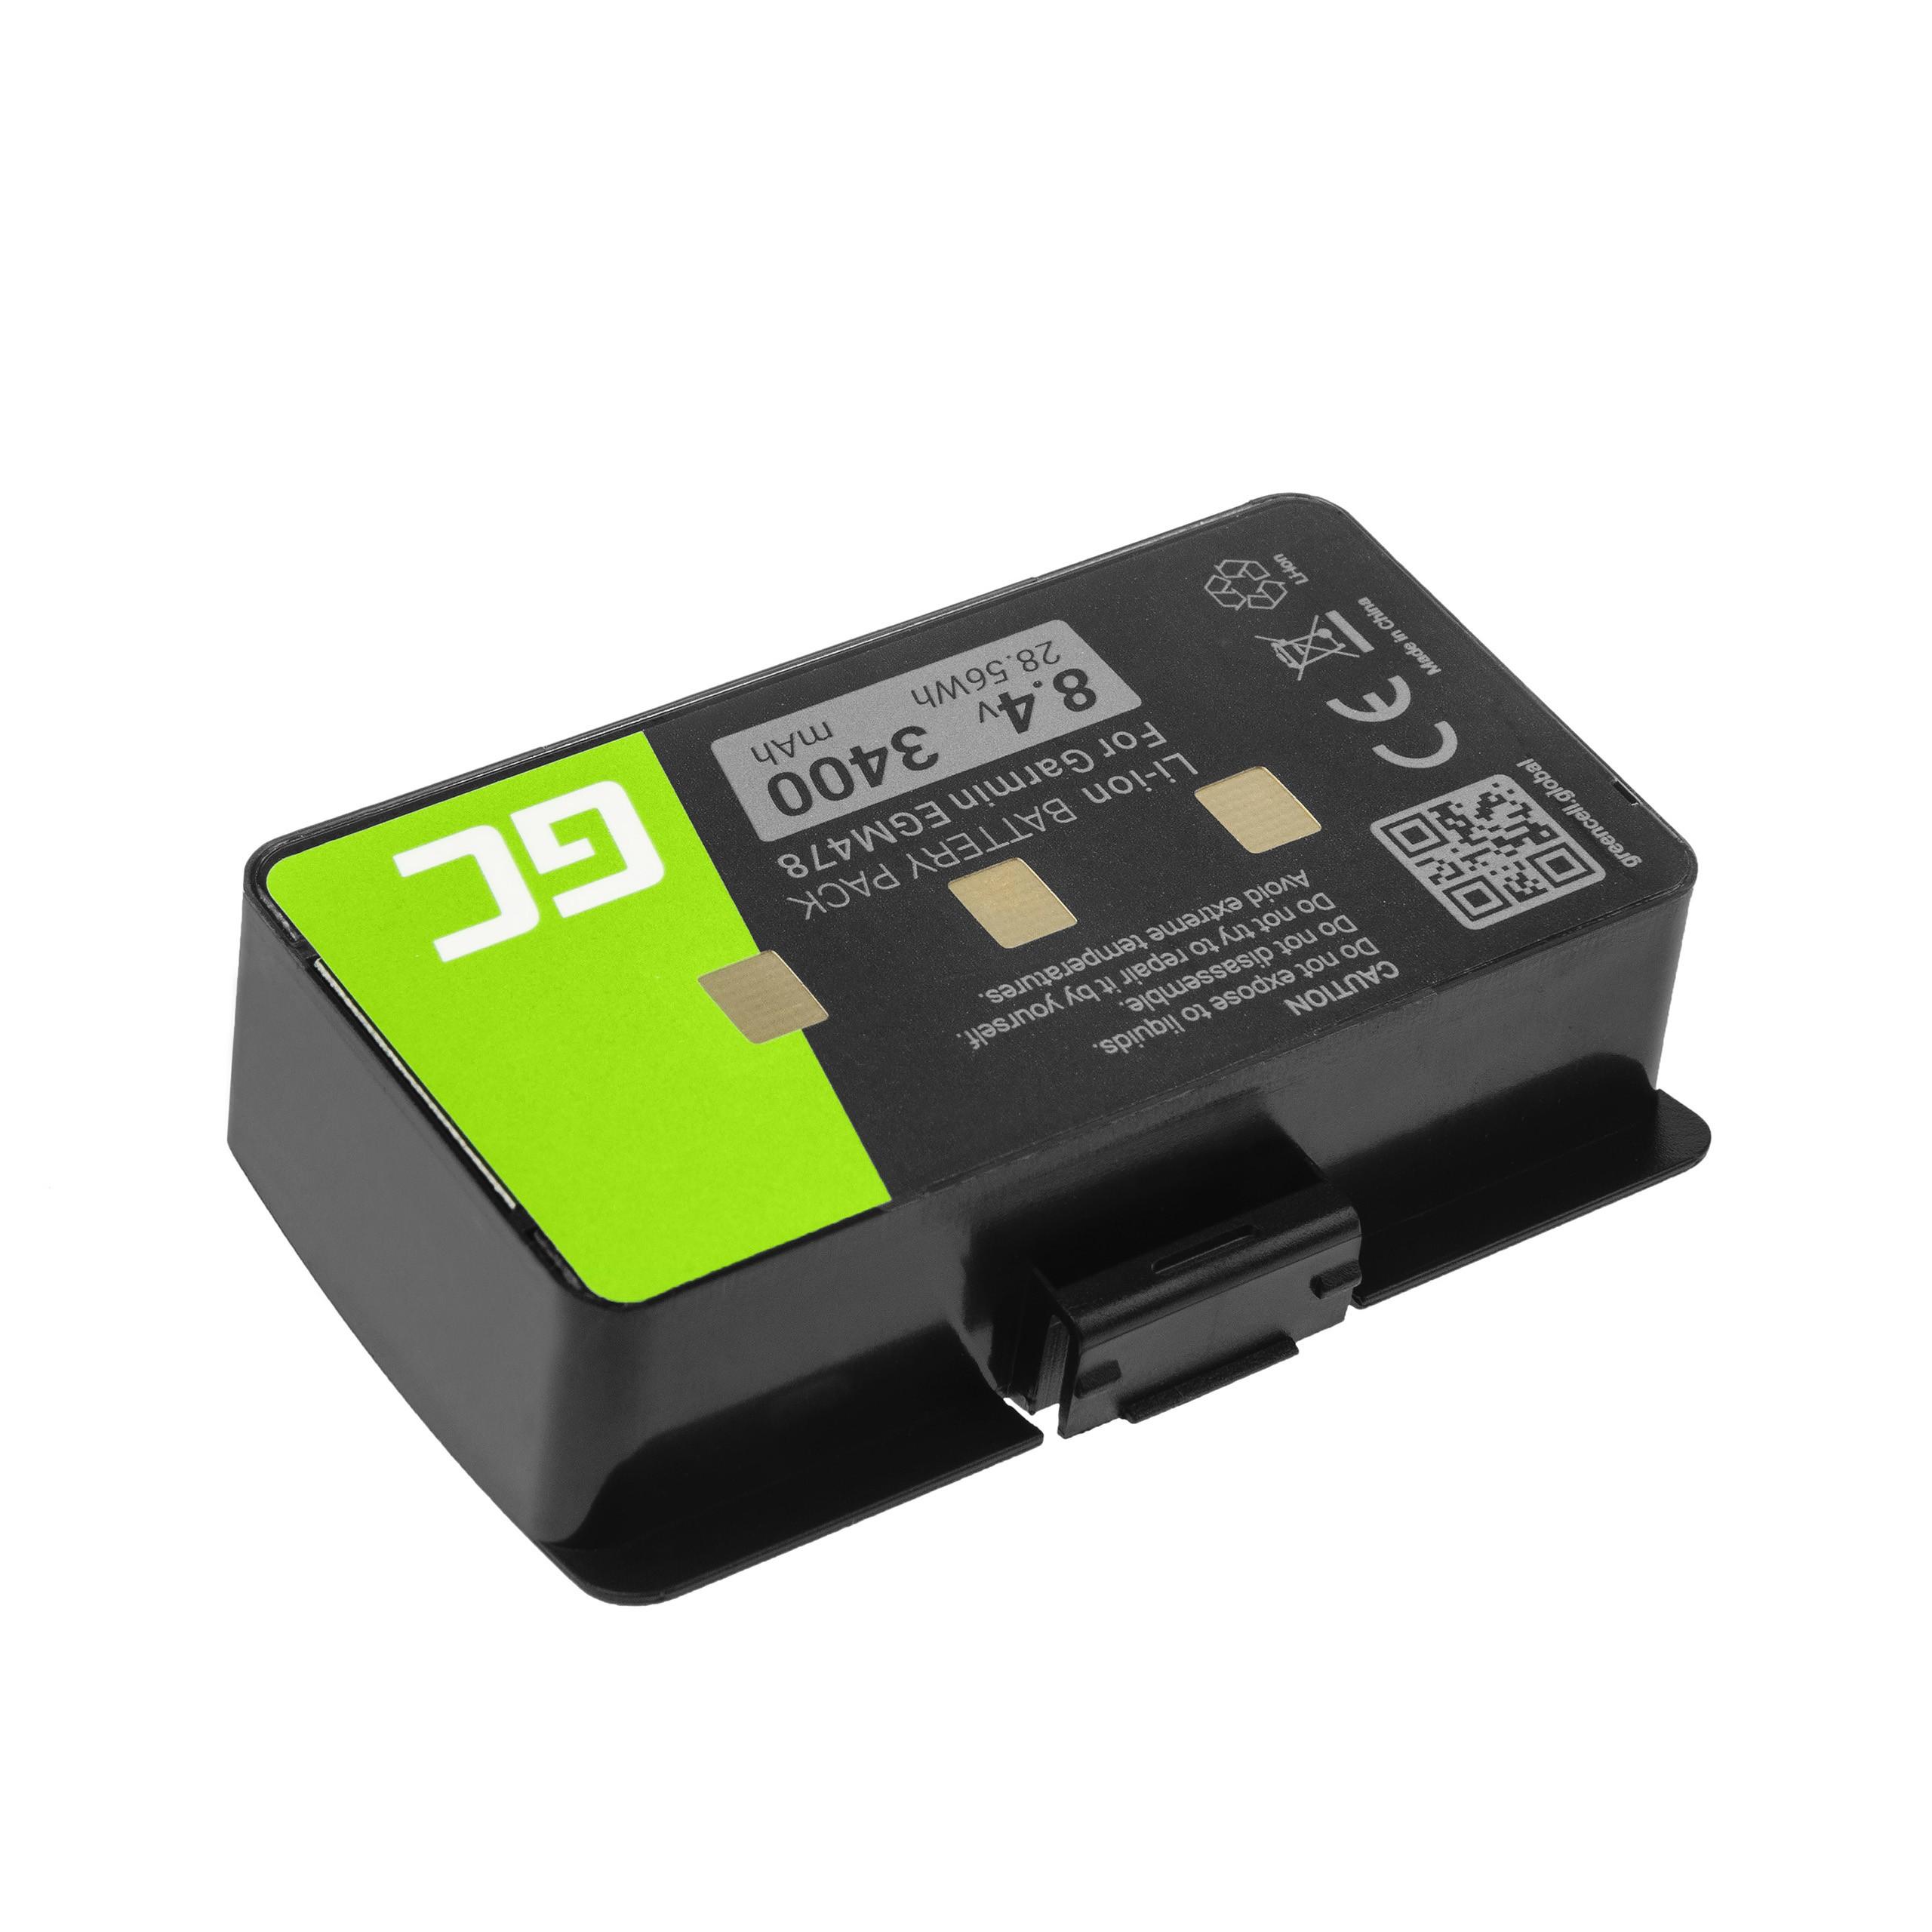 Green Cell 010-10517-00 011-00955-00 GPS battery for Garmin GPSMAP 276 296 376 376c 396 495 496 navigācijas aksesuāri